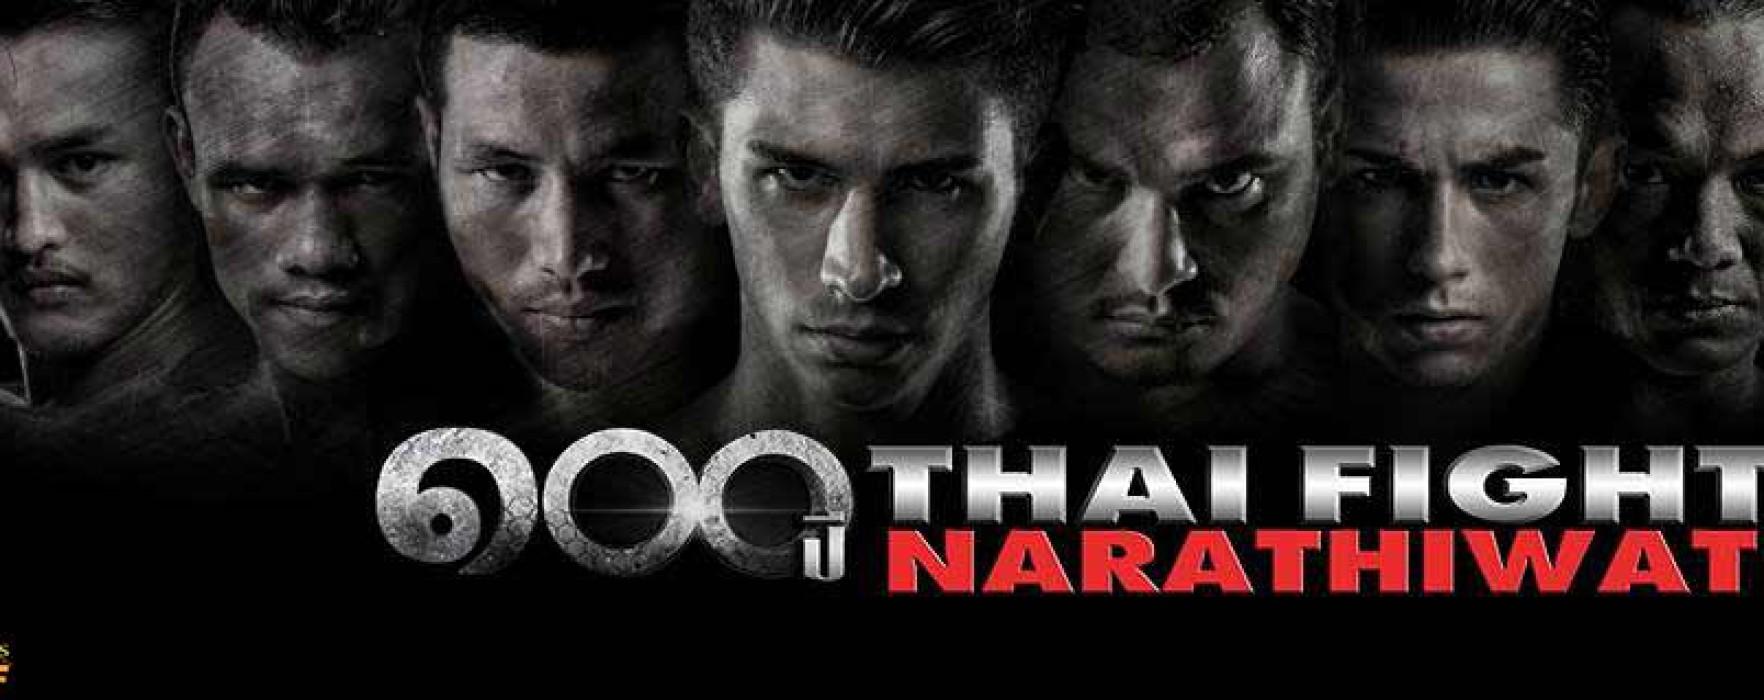 Card: Thai Fight Narathiwat featuring Saenchai, Saiyok, Sudsakorn, Jimmy Vienot, Karlito etc – 22nd August 2015